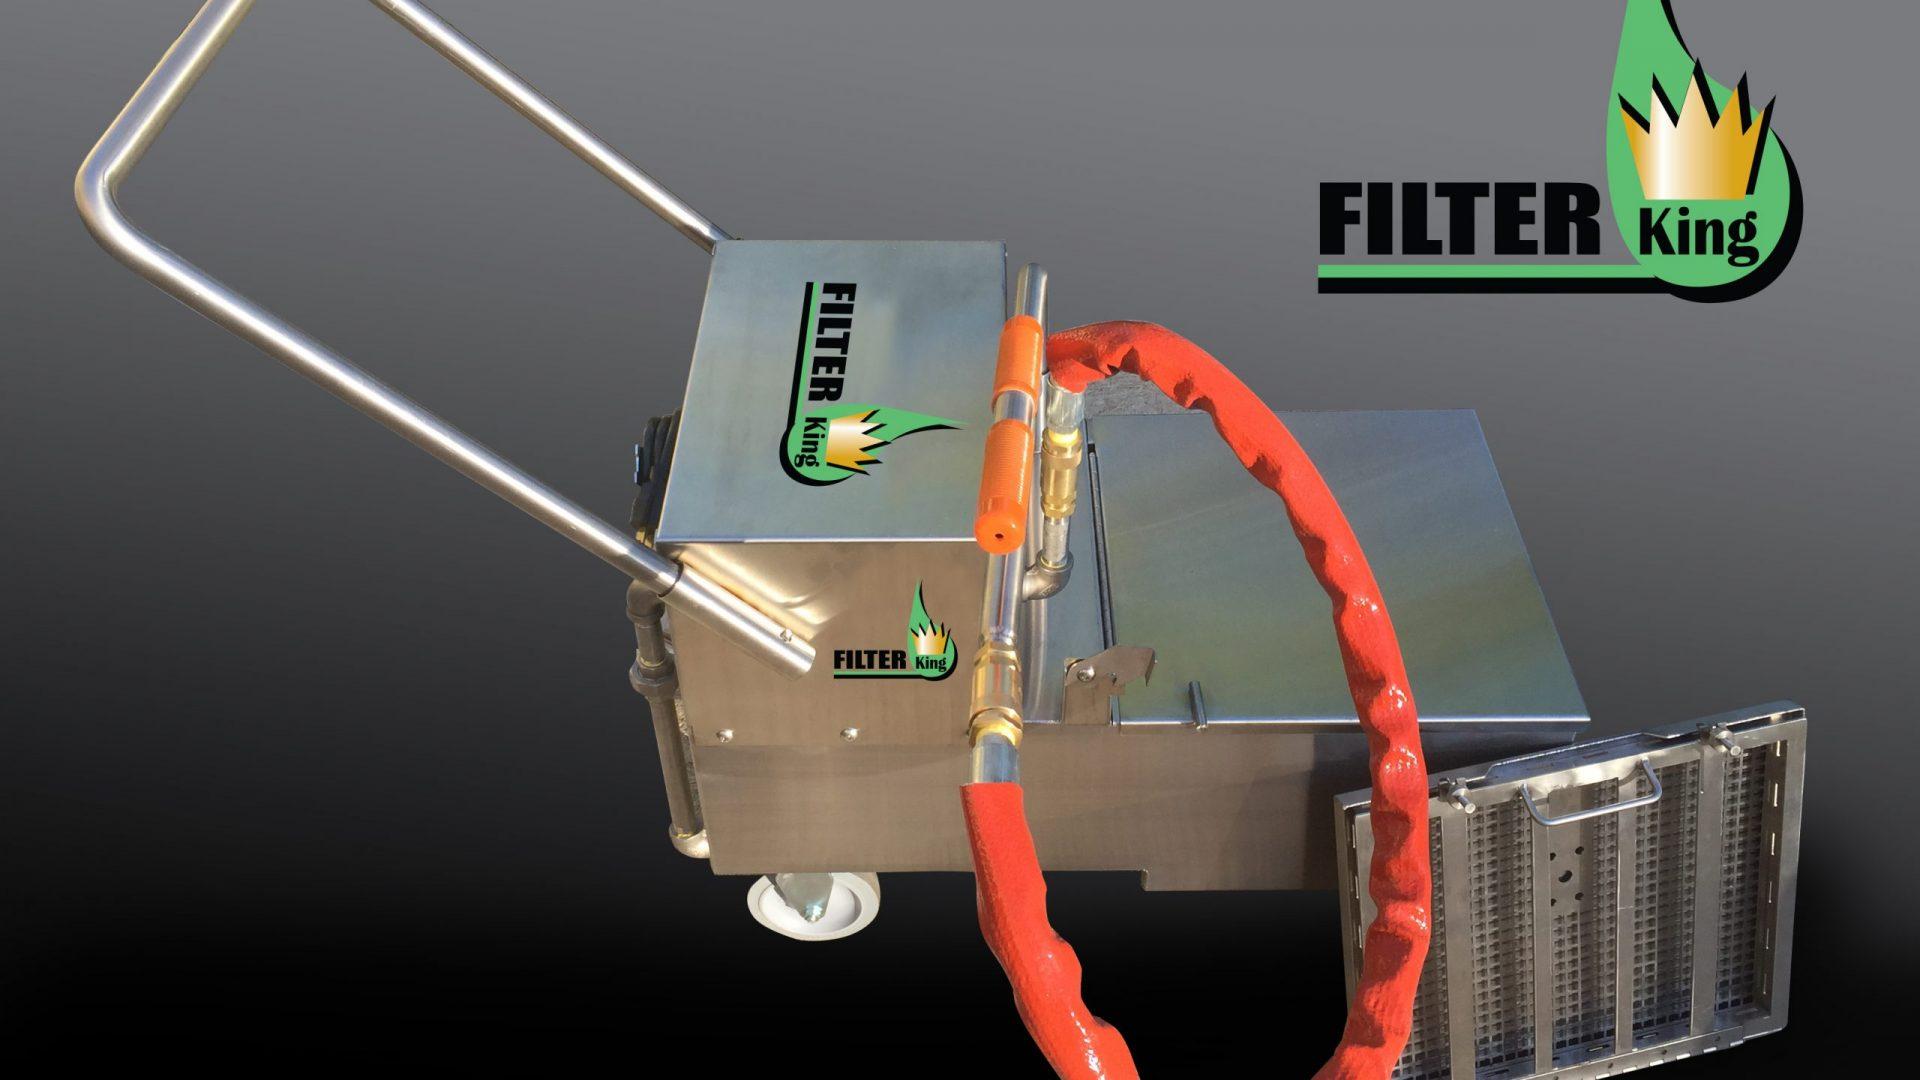 Micro Filter King Machine Demo